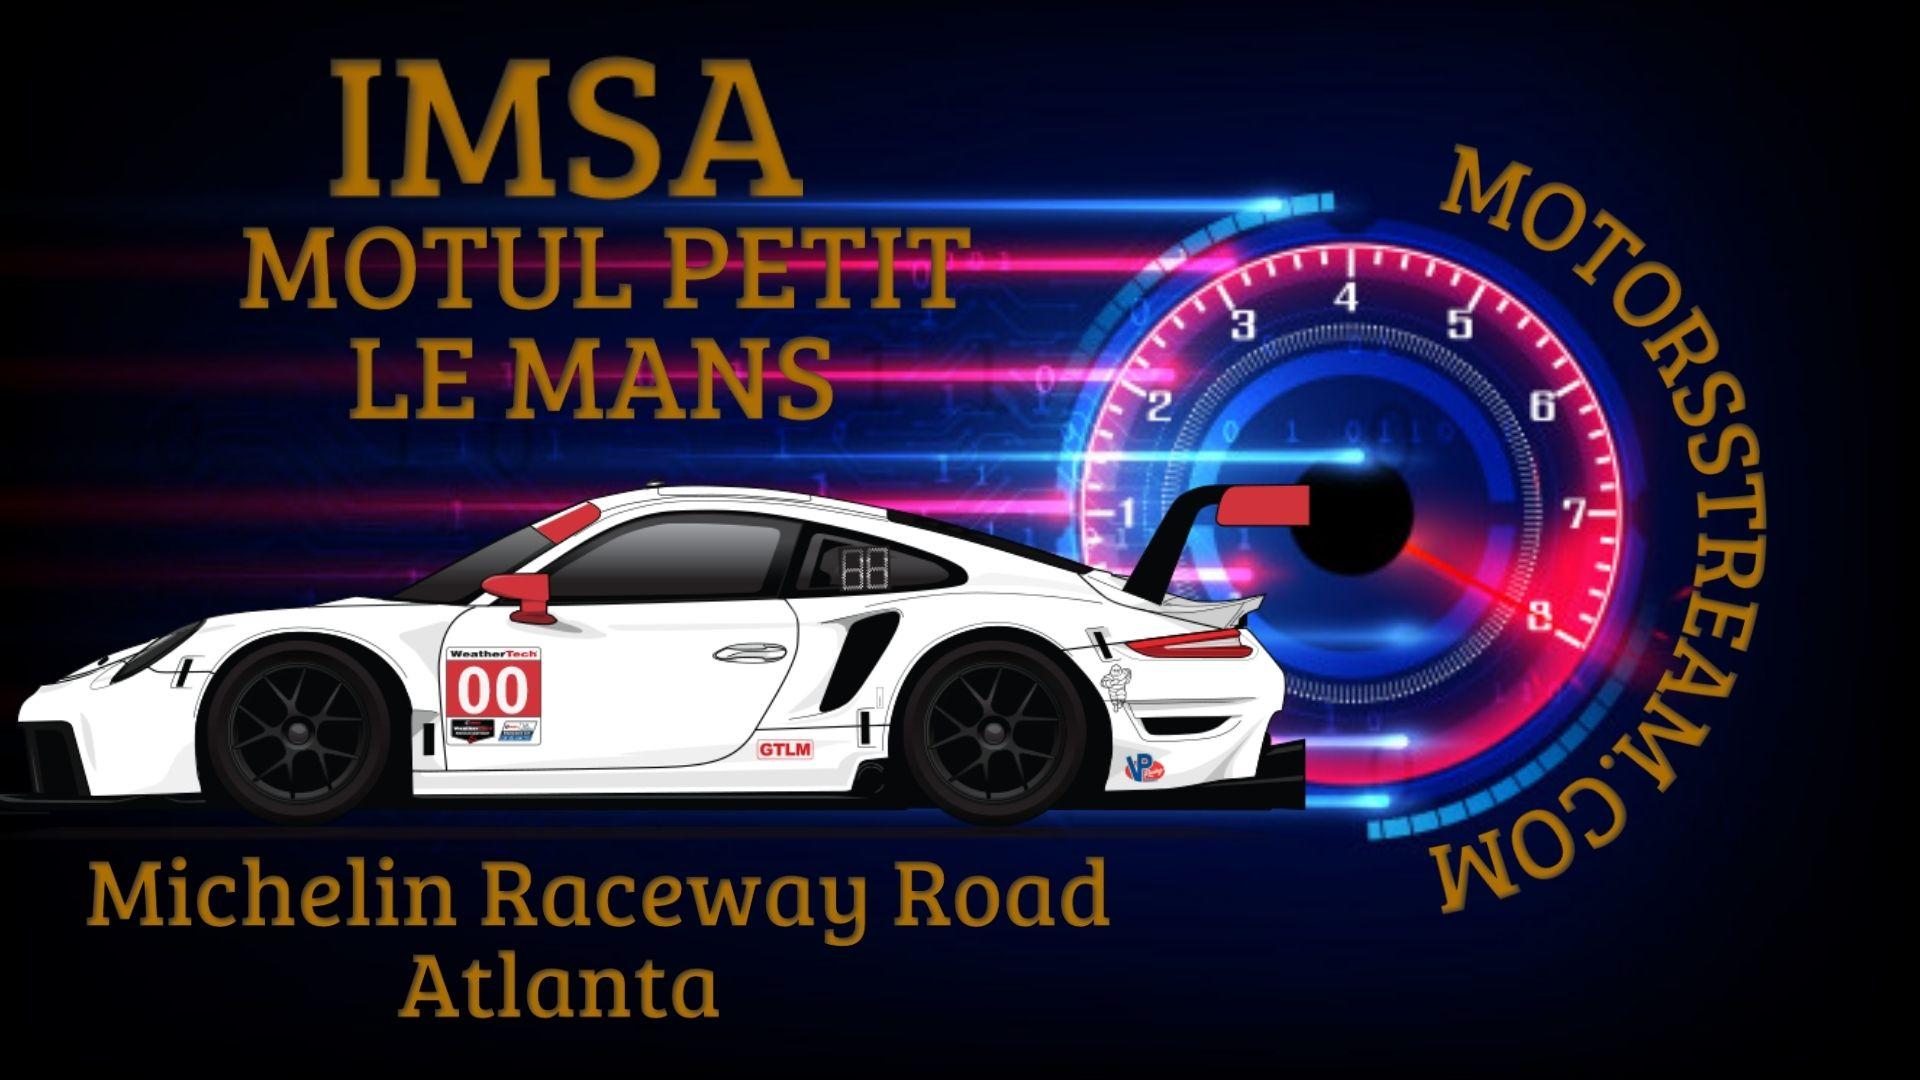 Motul Petit Le Mans IMSA | Live Stream 2021